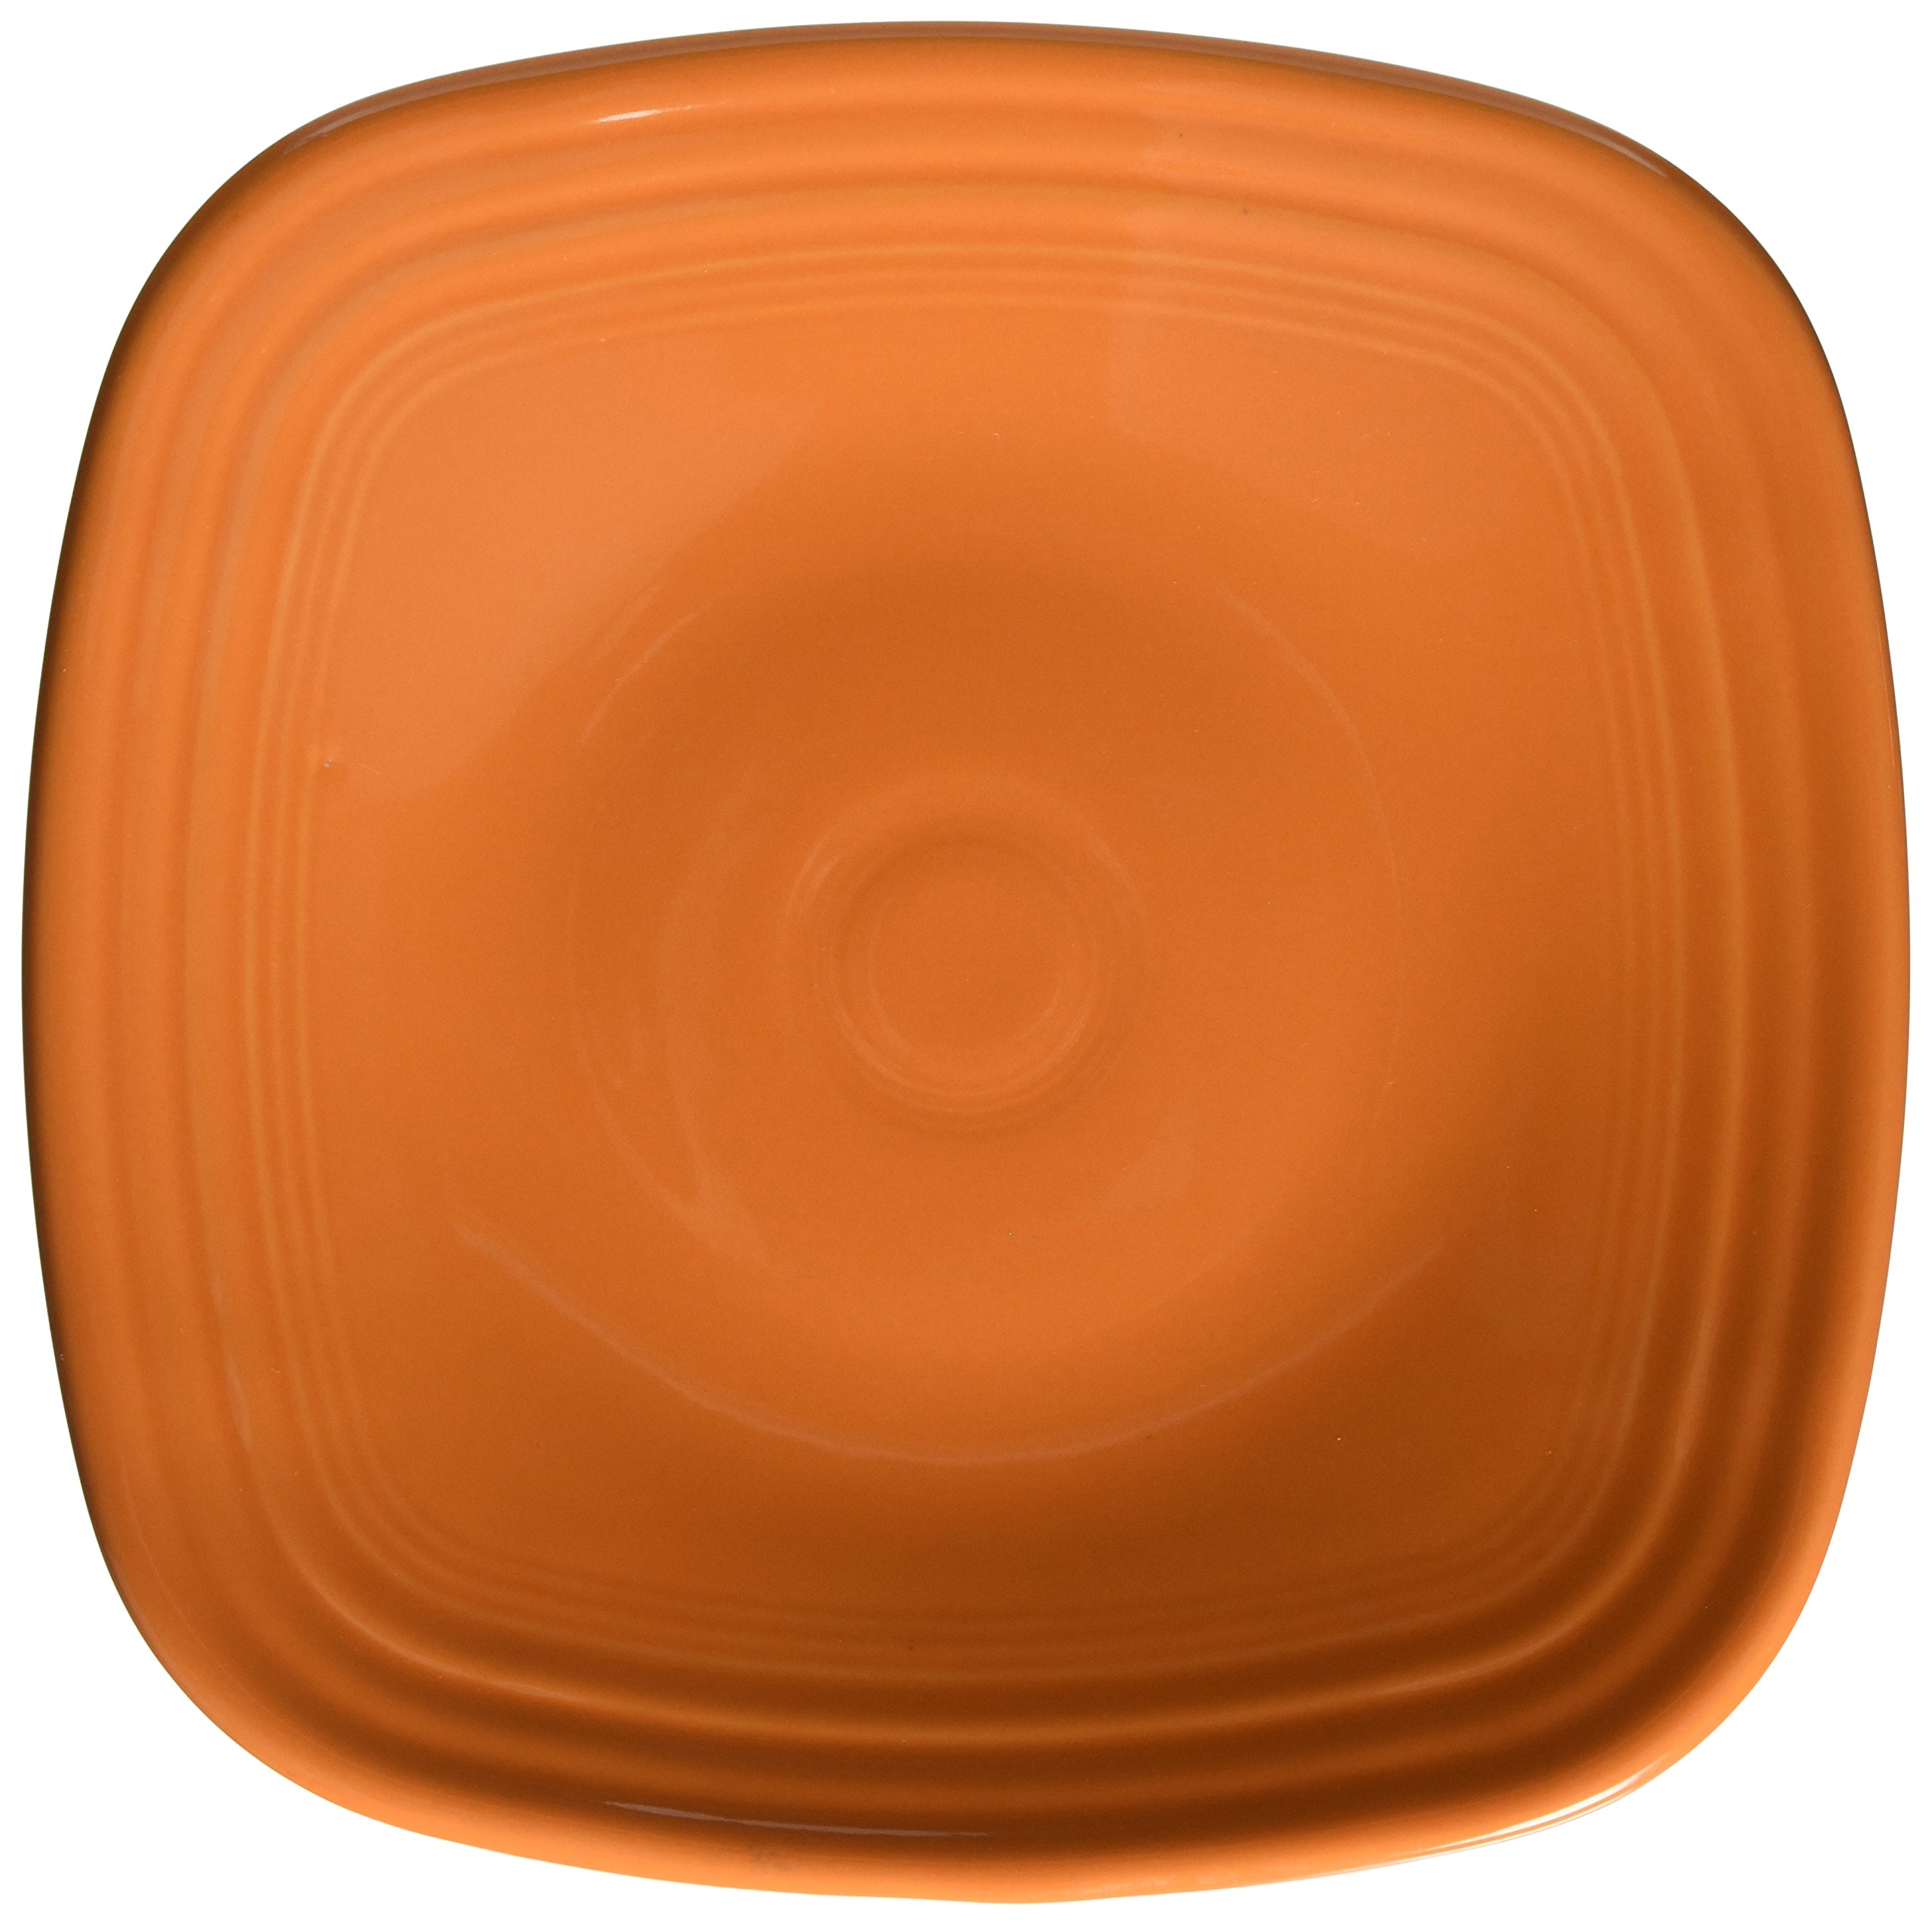 Fiesta 9-1/8-Inch Square Luncheon Plate Tangerine